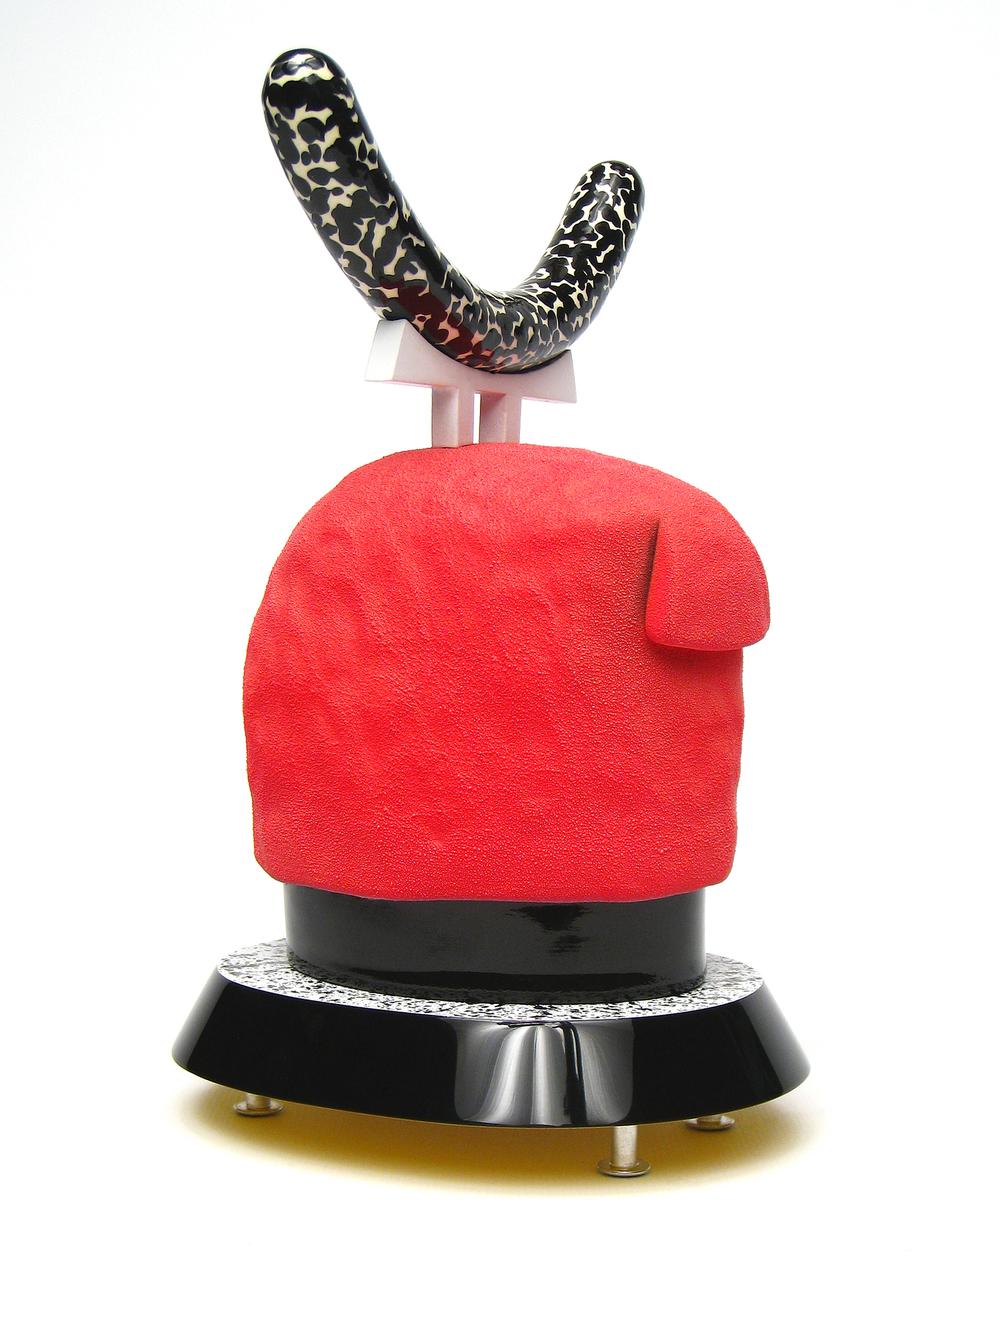 12.    Ettoreushi     2011    5.5 L x 4.5 W x 7.5 H    White earthenware, underglaze, glaze, wood, acrylic, flocking, rare earth magnets